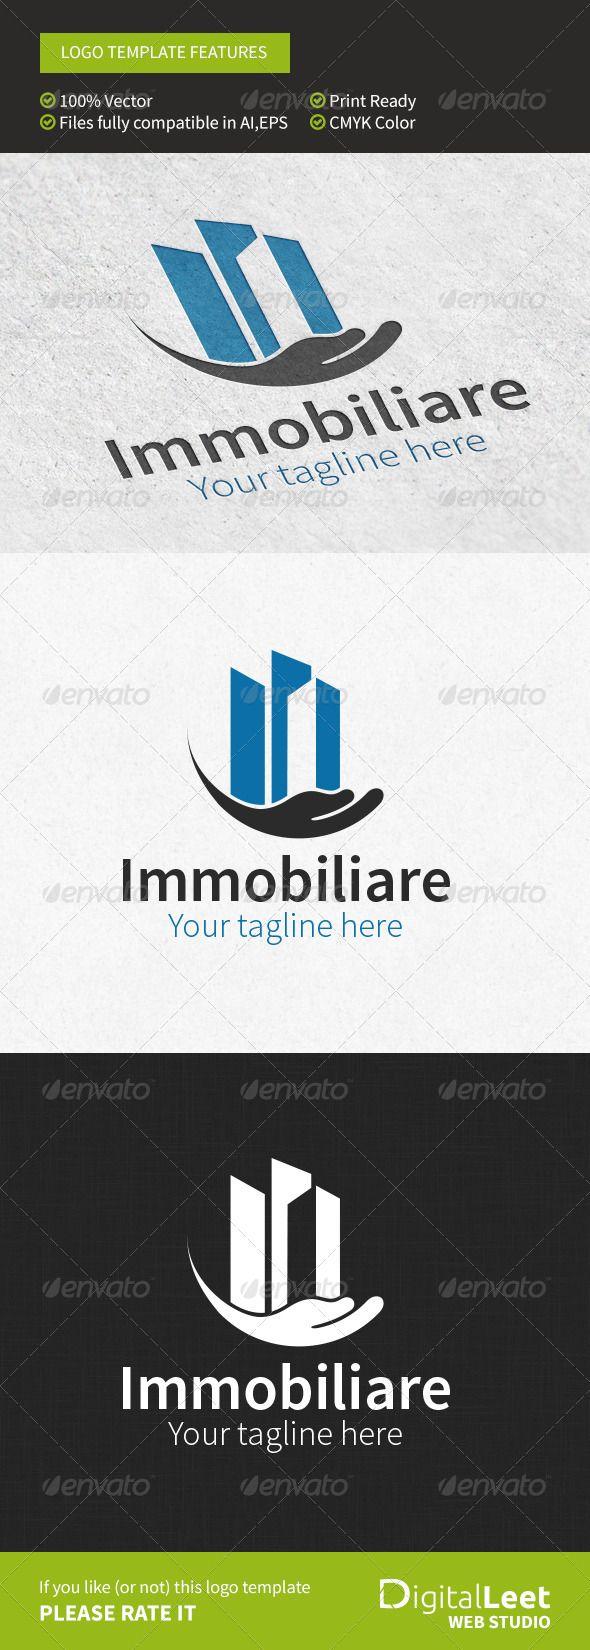 Immobiliare Real Estate Logo Design Template Vector #logotype Download it here:  http://graphicriver.net/item/immobiliare-real-estate-logo-template/8746184?s_rank=433?ref=nesto